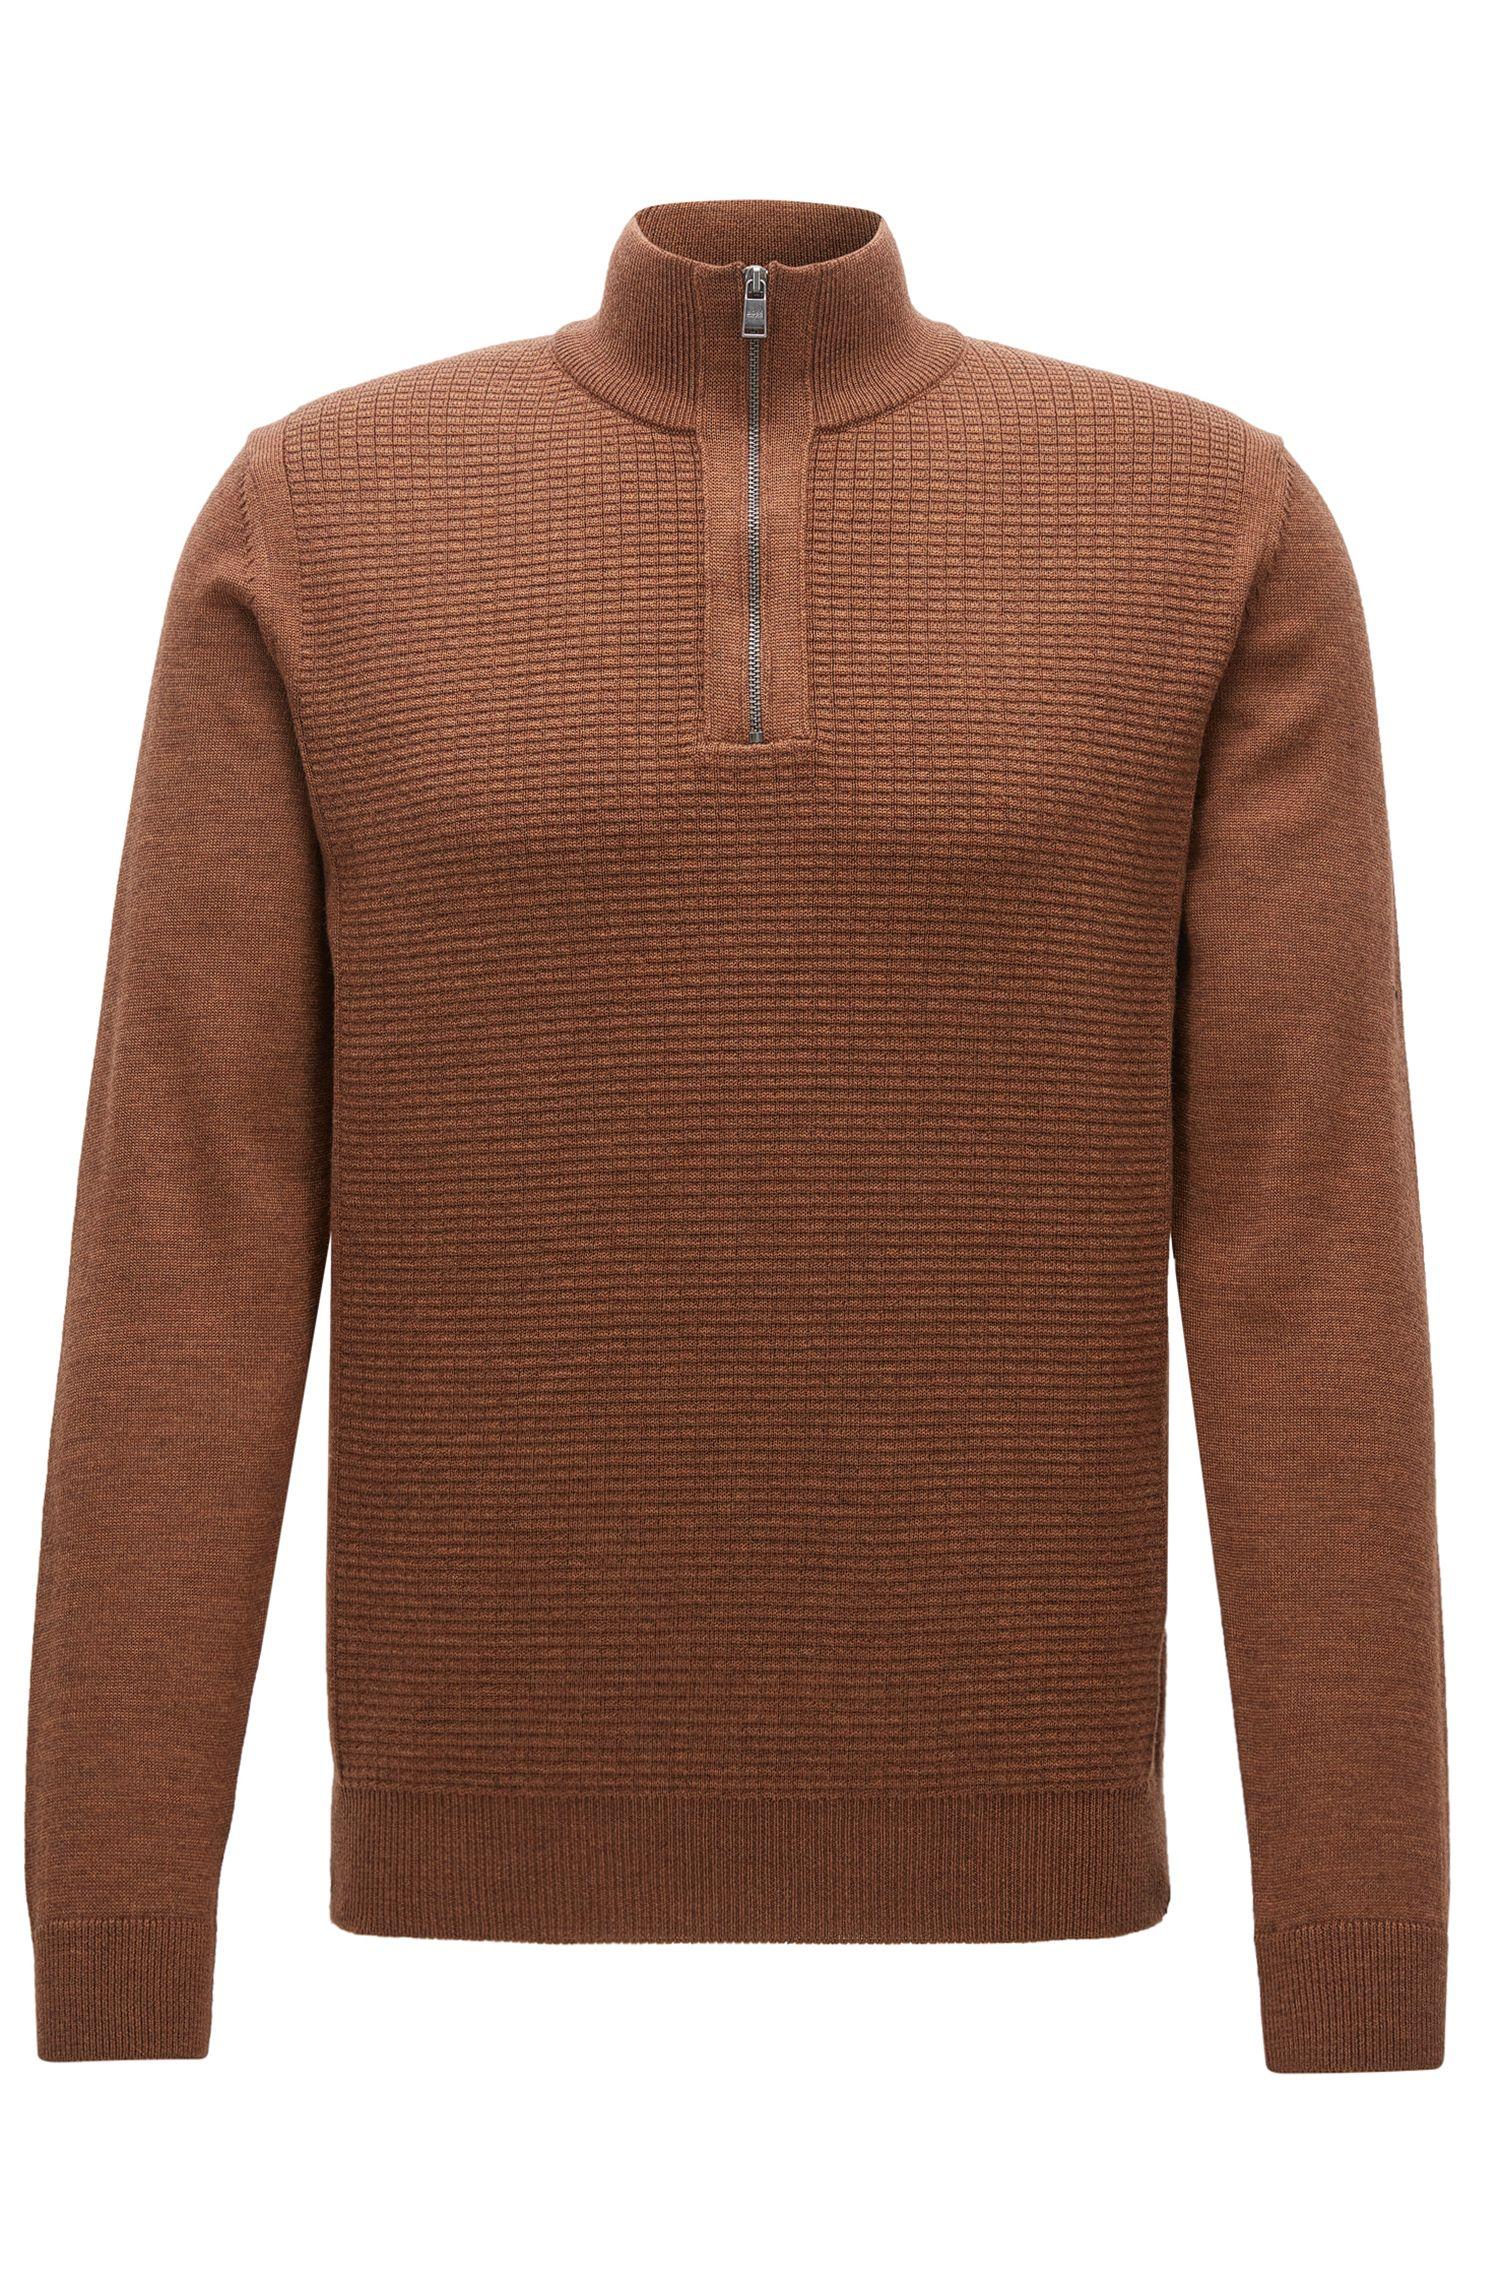 'Nacello'   Virgin Wool Sweater